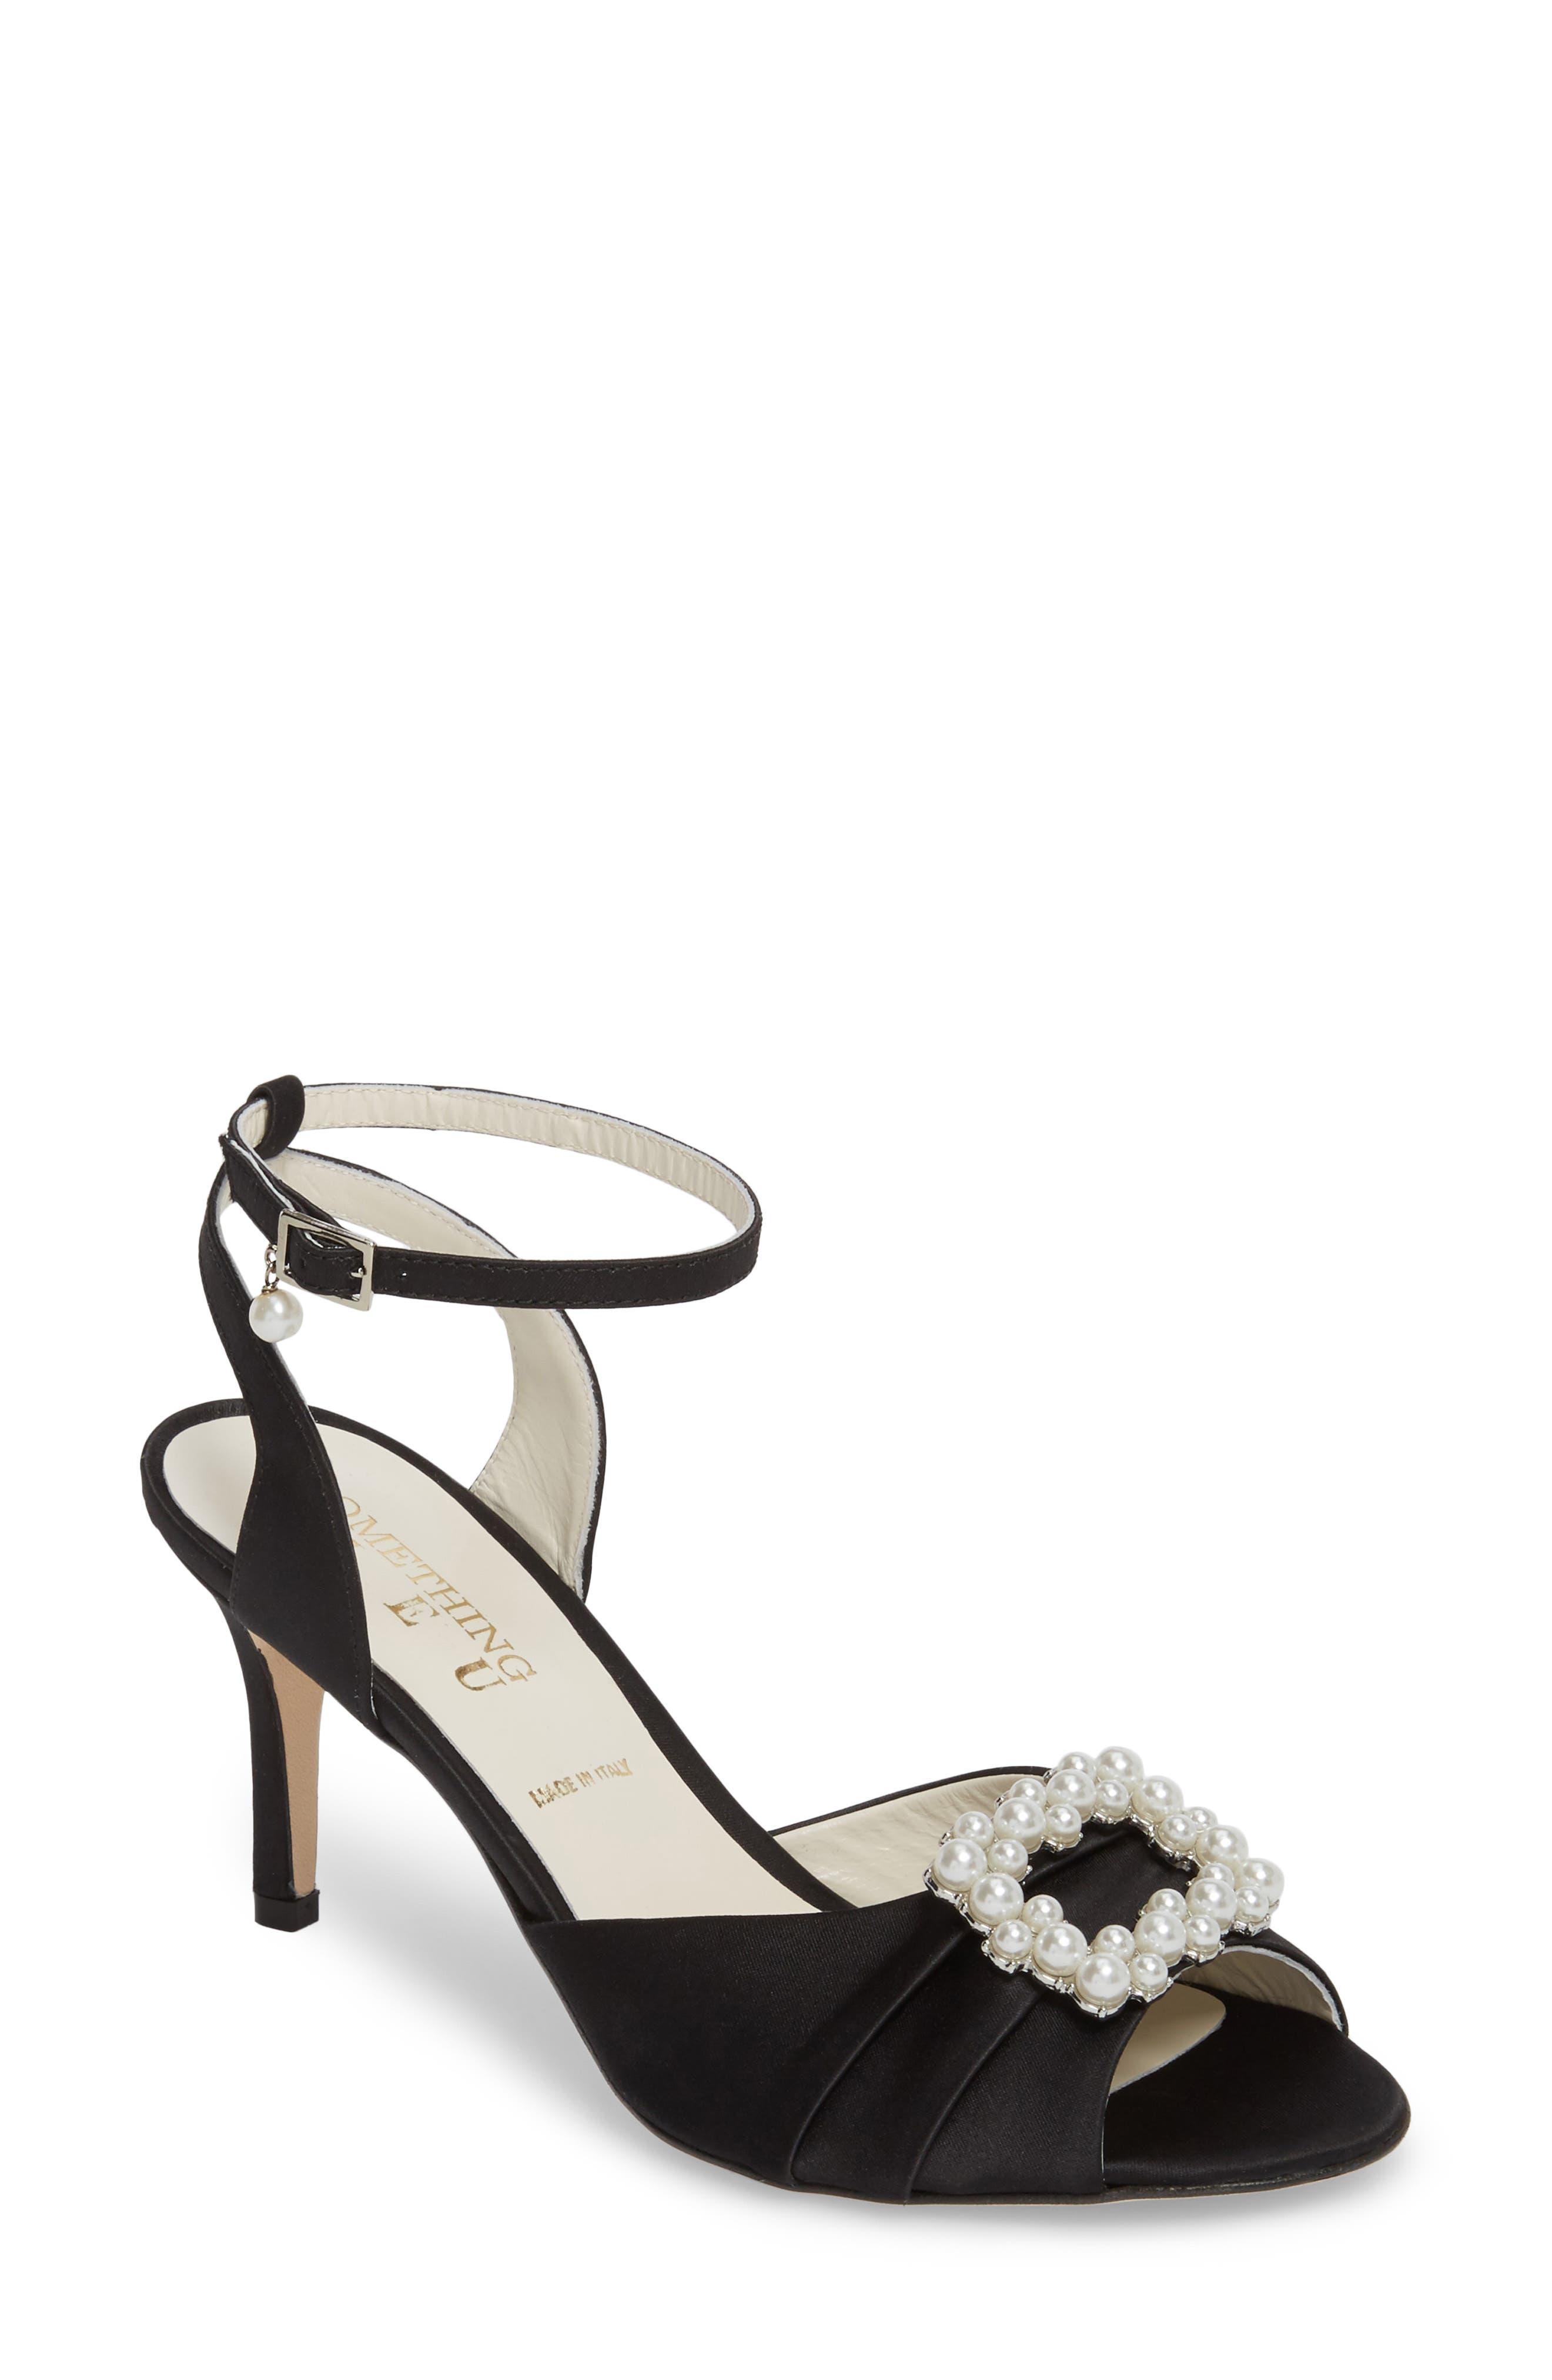 Godiva Imitation Pearl Buckle Sandal,                         Main,                         color, BLACK SATIN